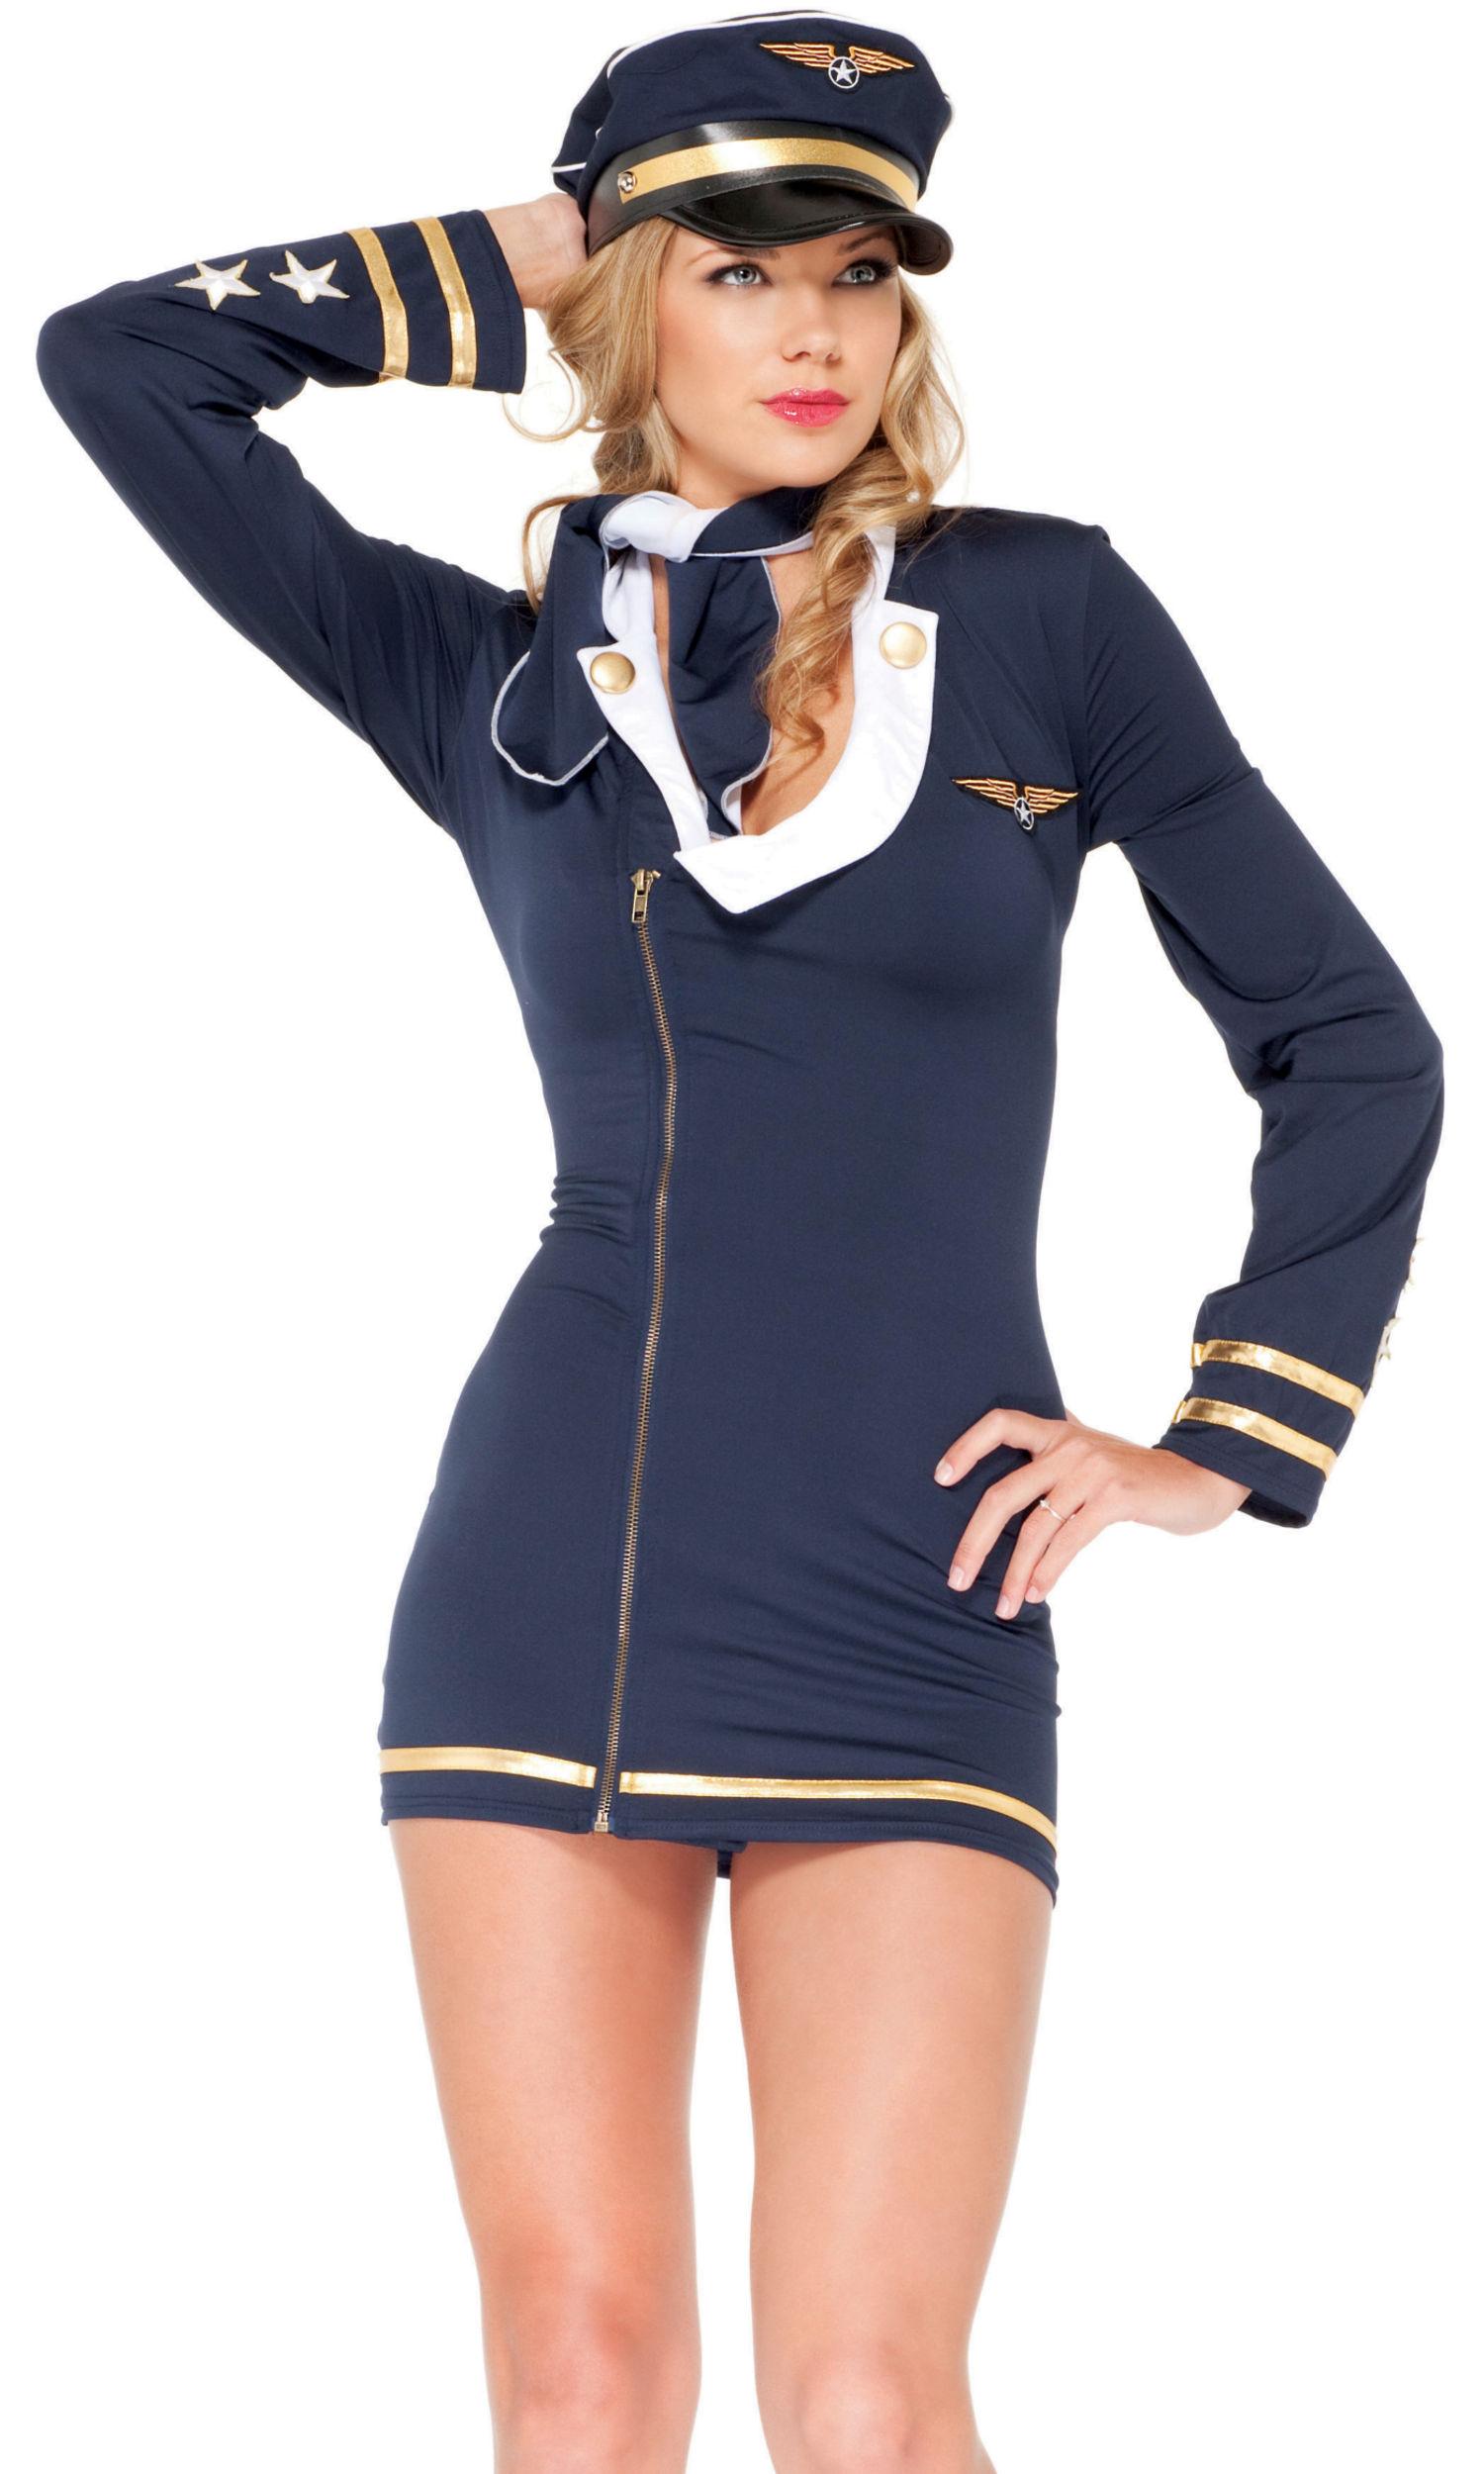 1bbbfa9824b Mile High Maiden Sexy Pilot Costume